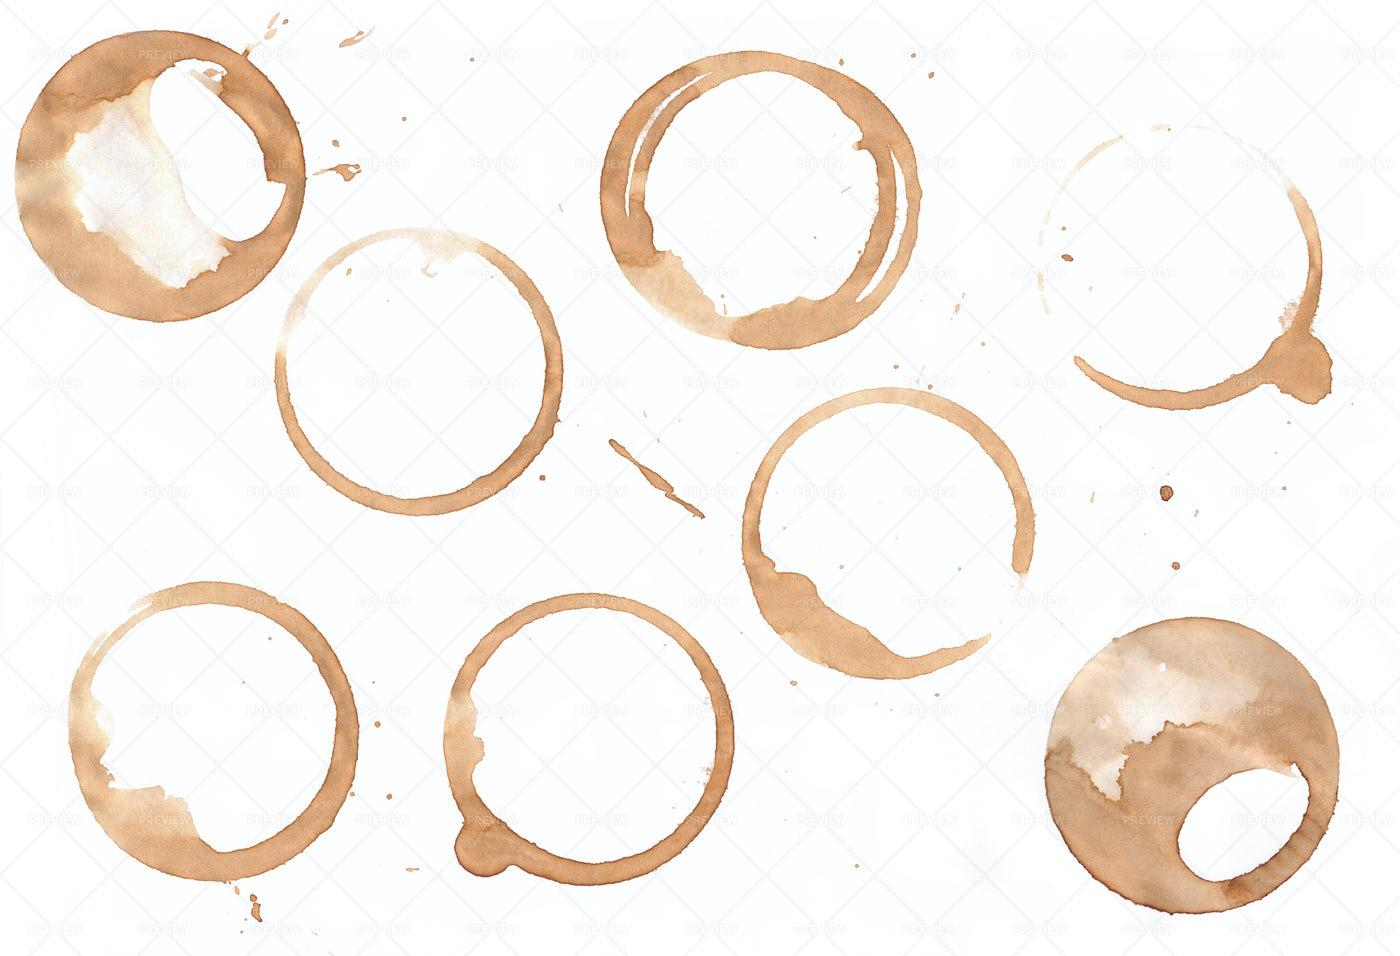 Coffee Stain Rings: Stock Photos